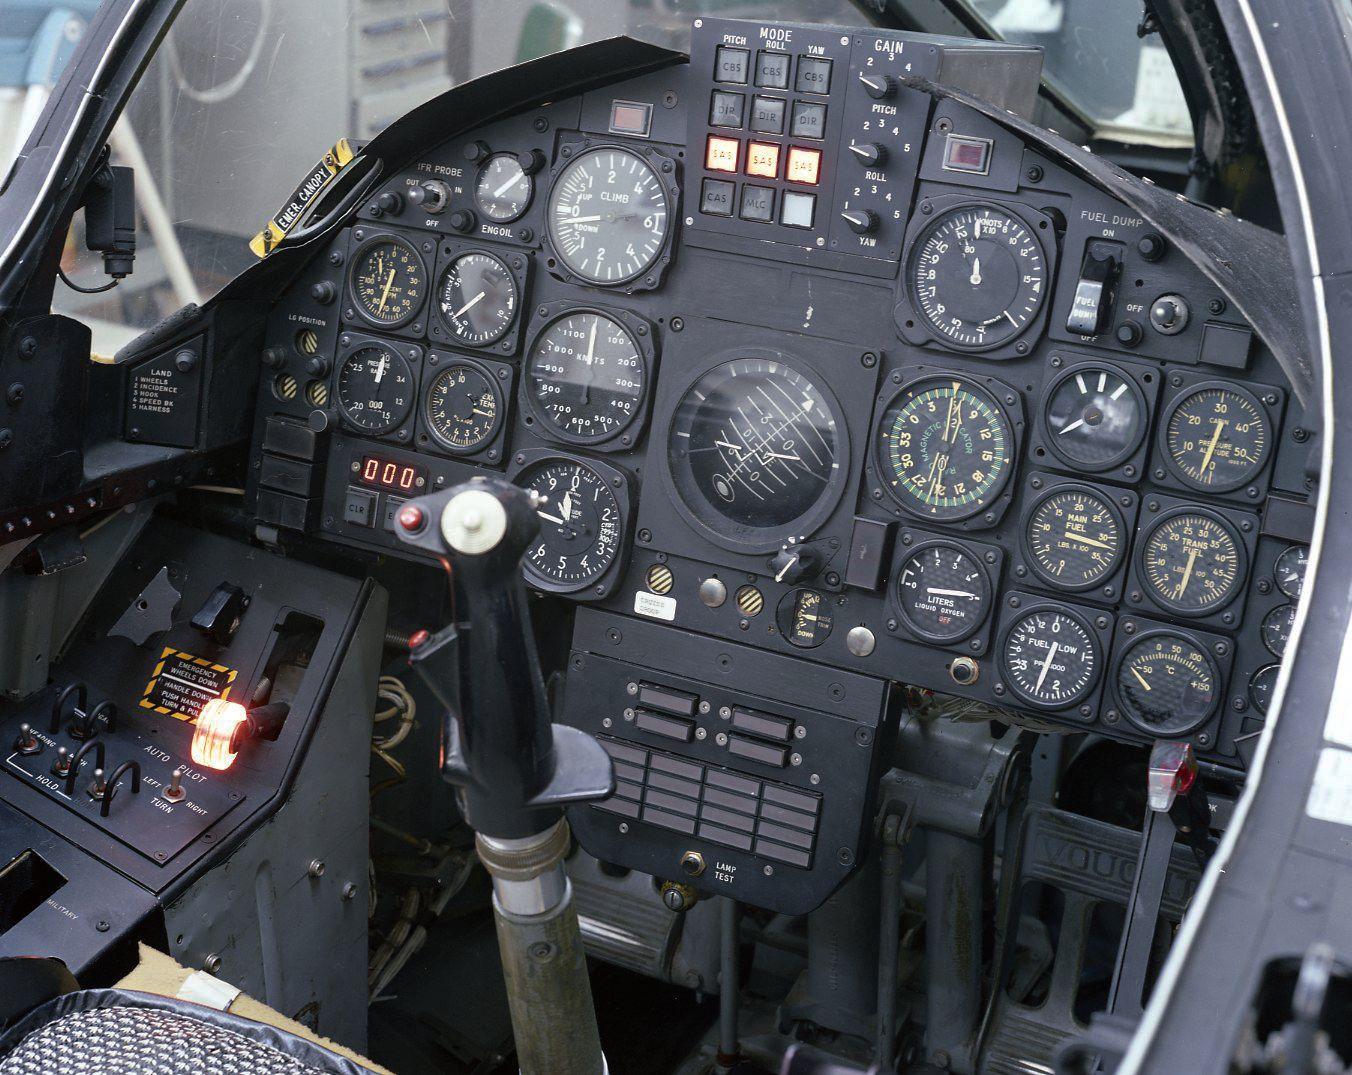 medium resolution of f 8 digital fly by wire cockpit